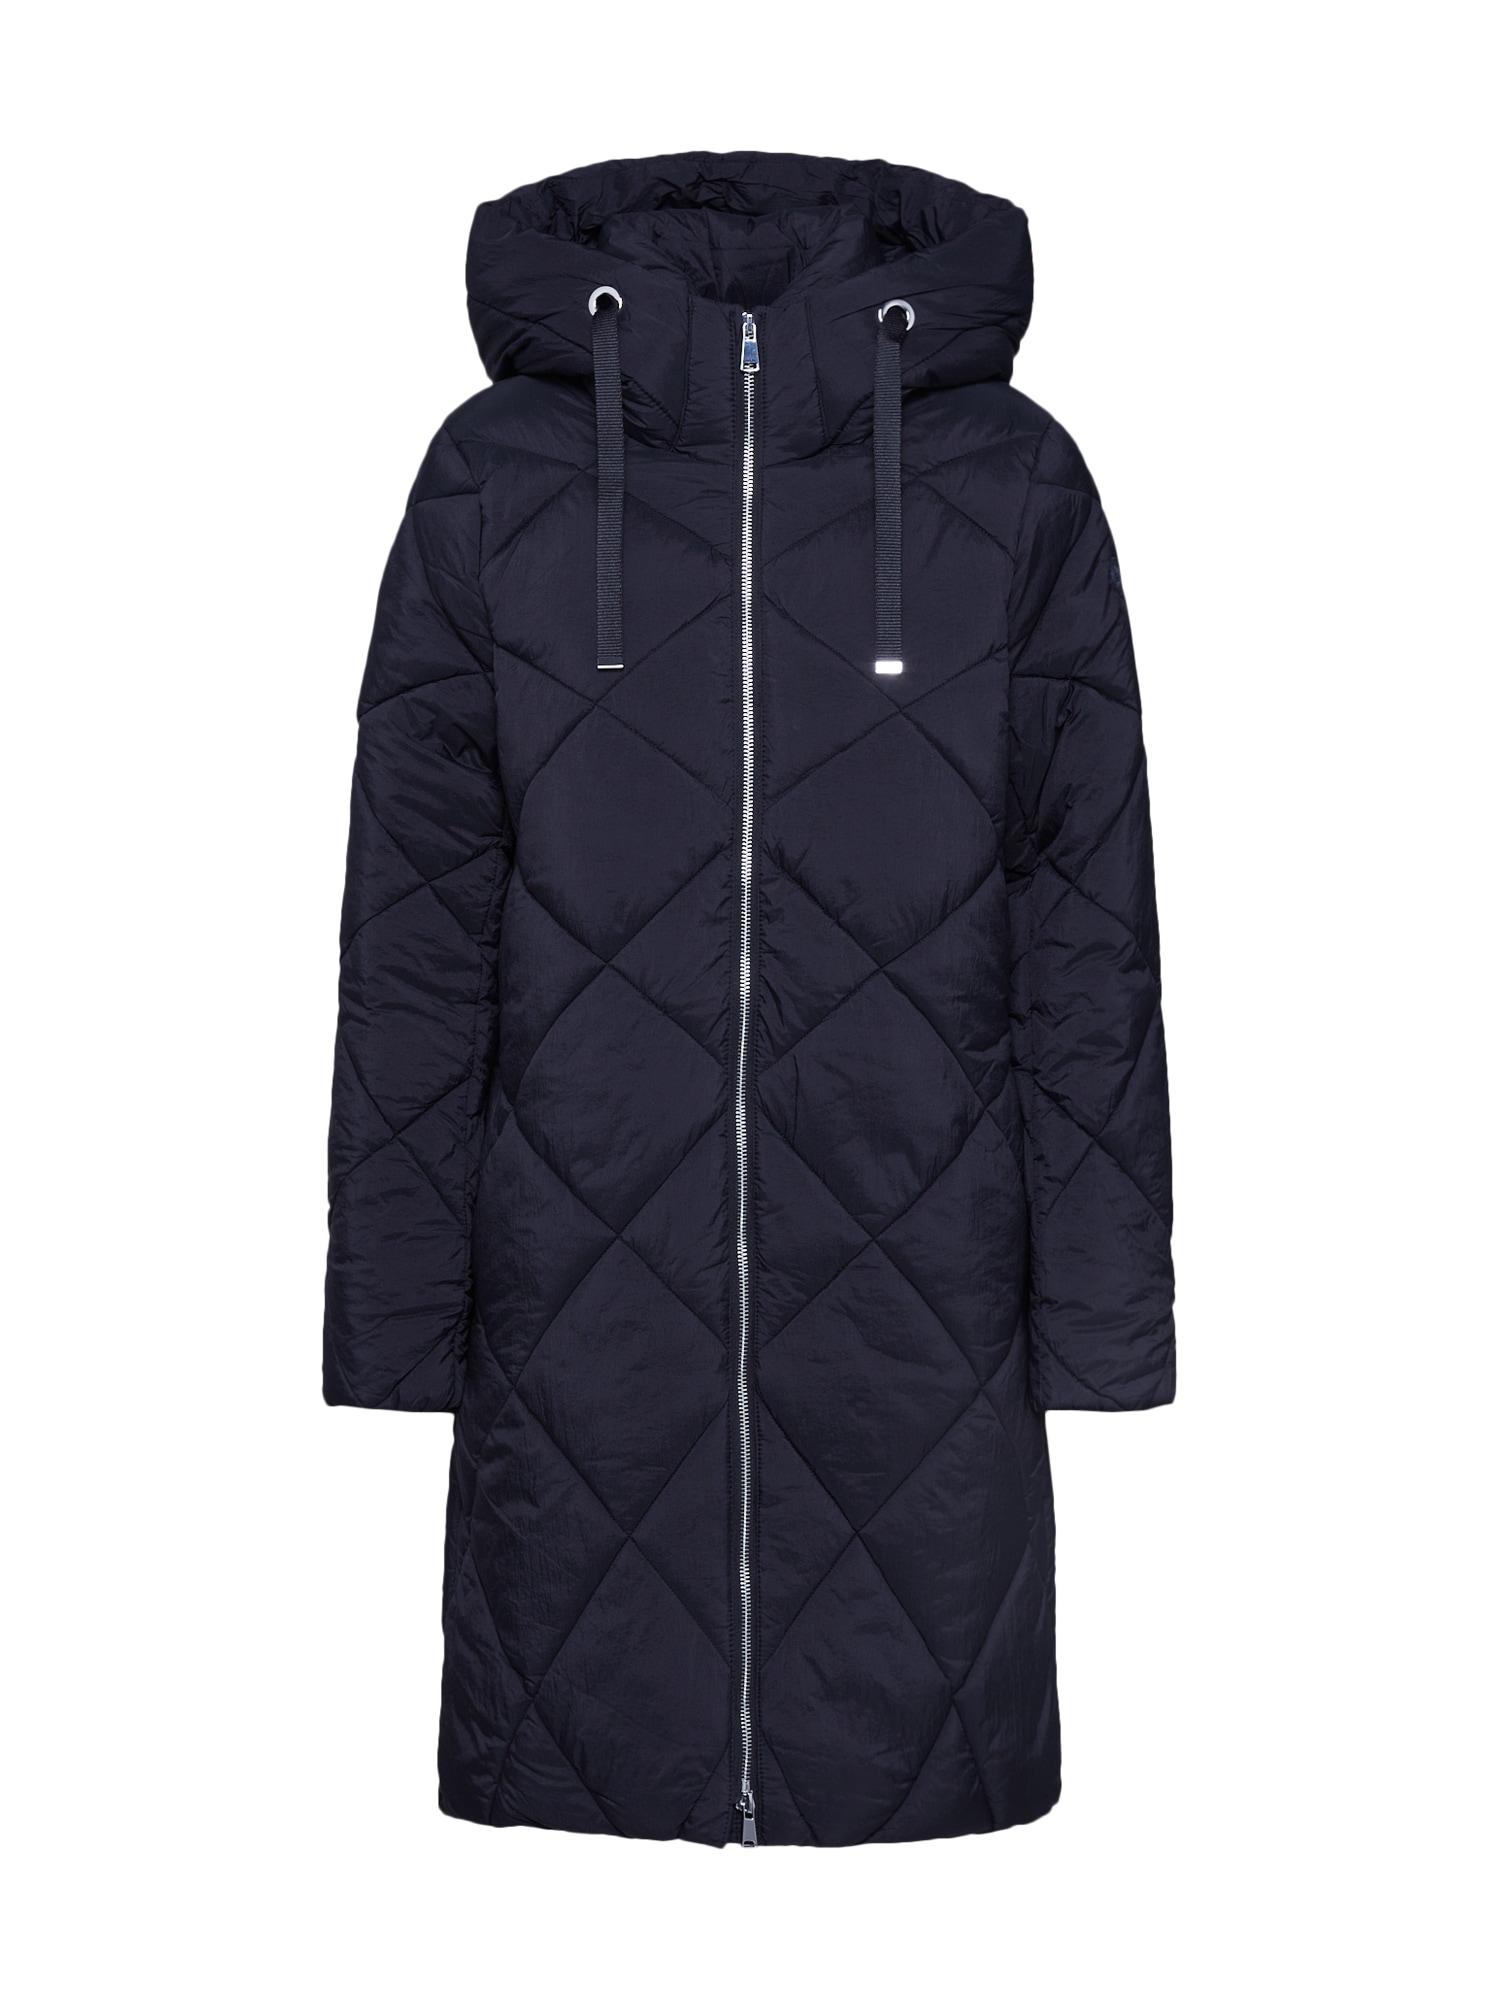 ESPRIT Zimní kabát 'Quilted coat'  černá